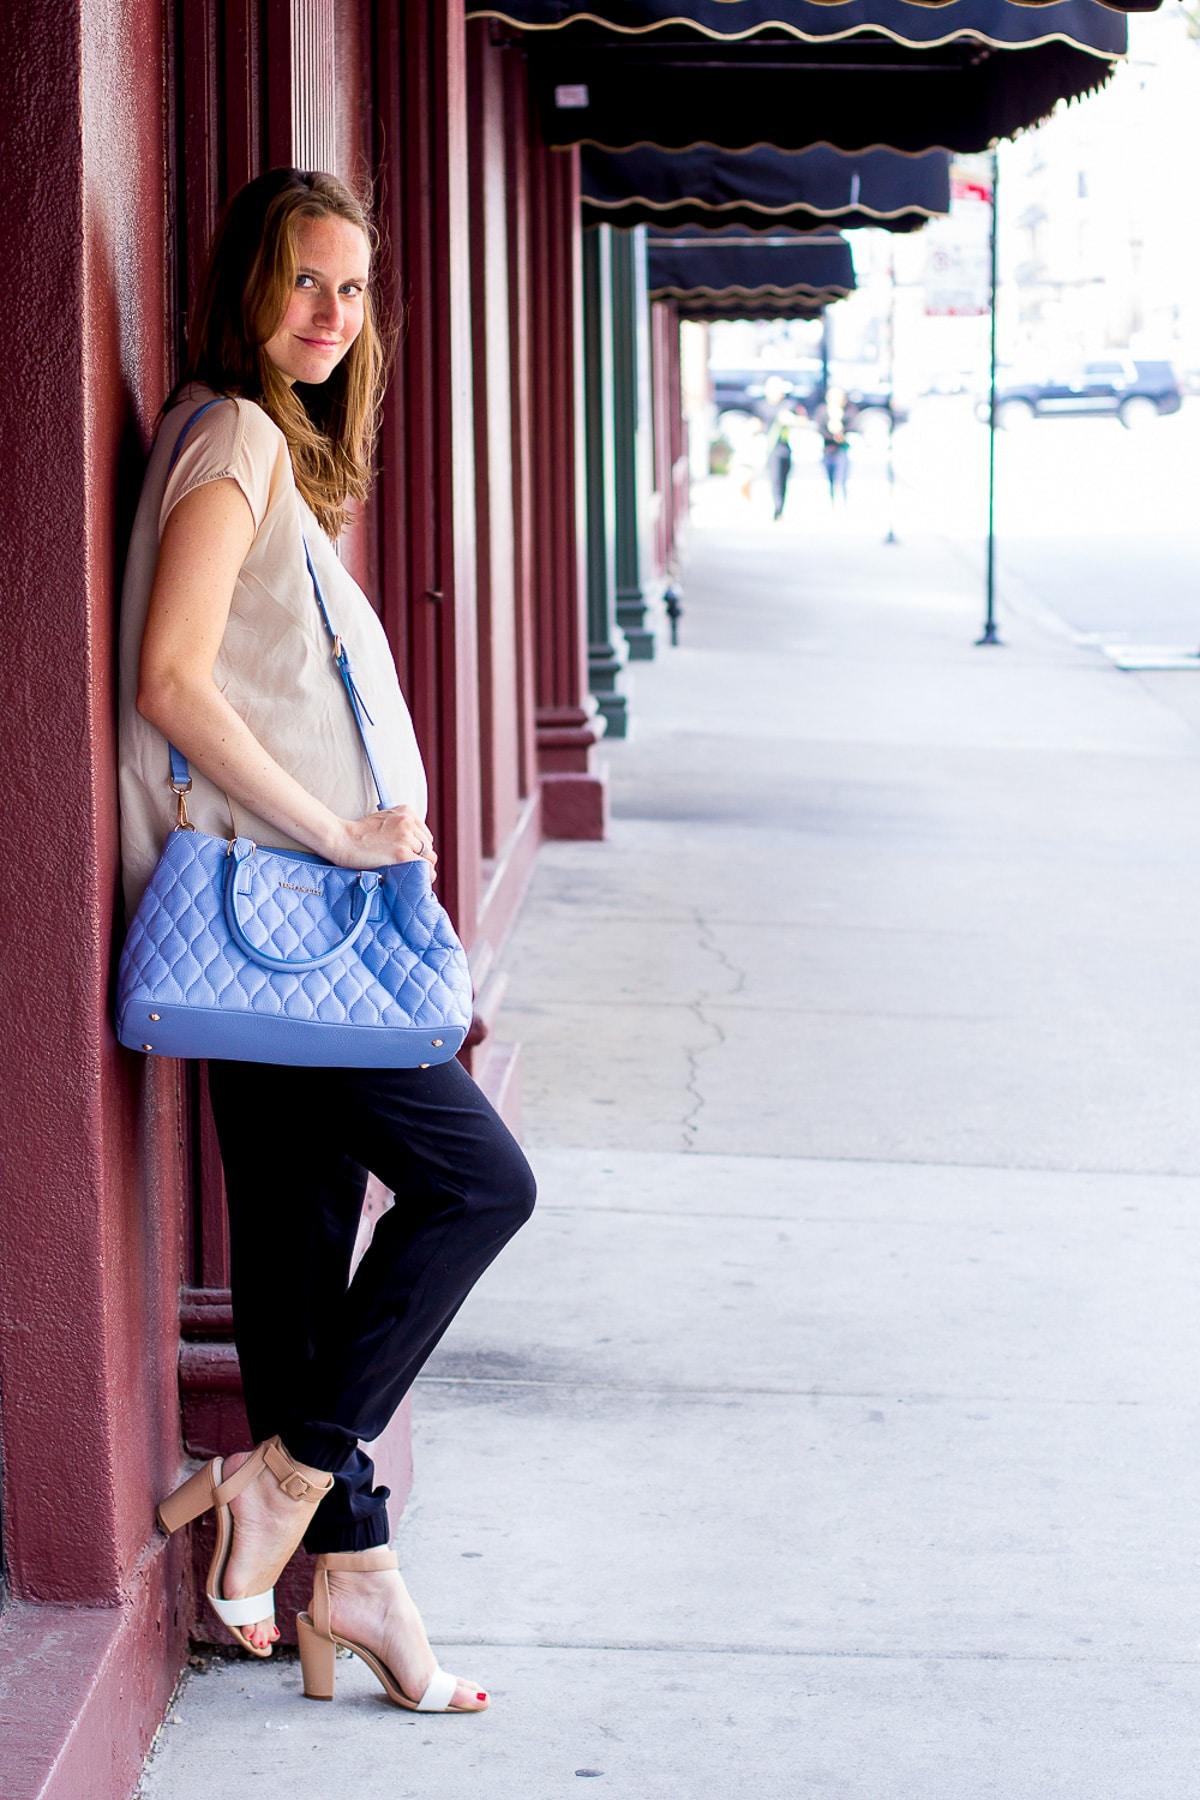 Vera Bradley Purse_Top US Fashion Blogger_How to style a blue purse-10